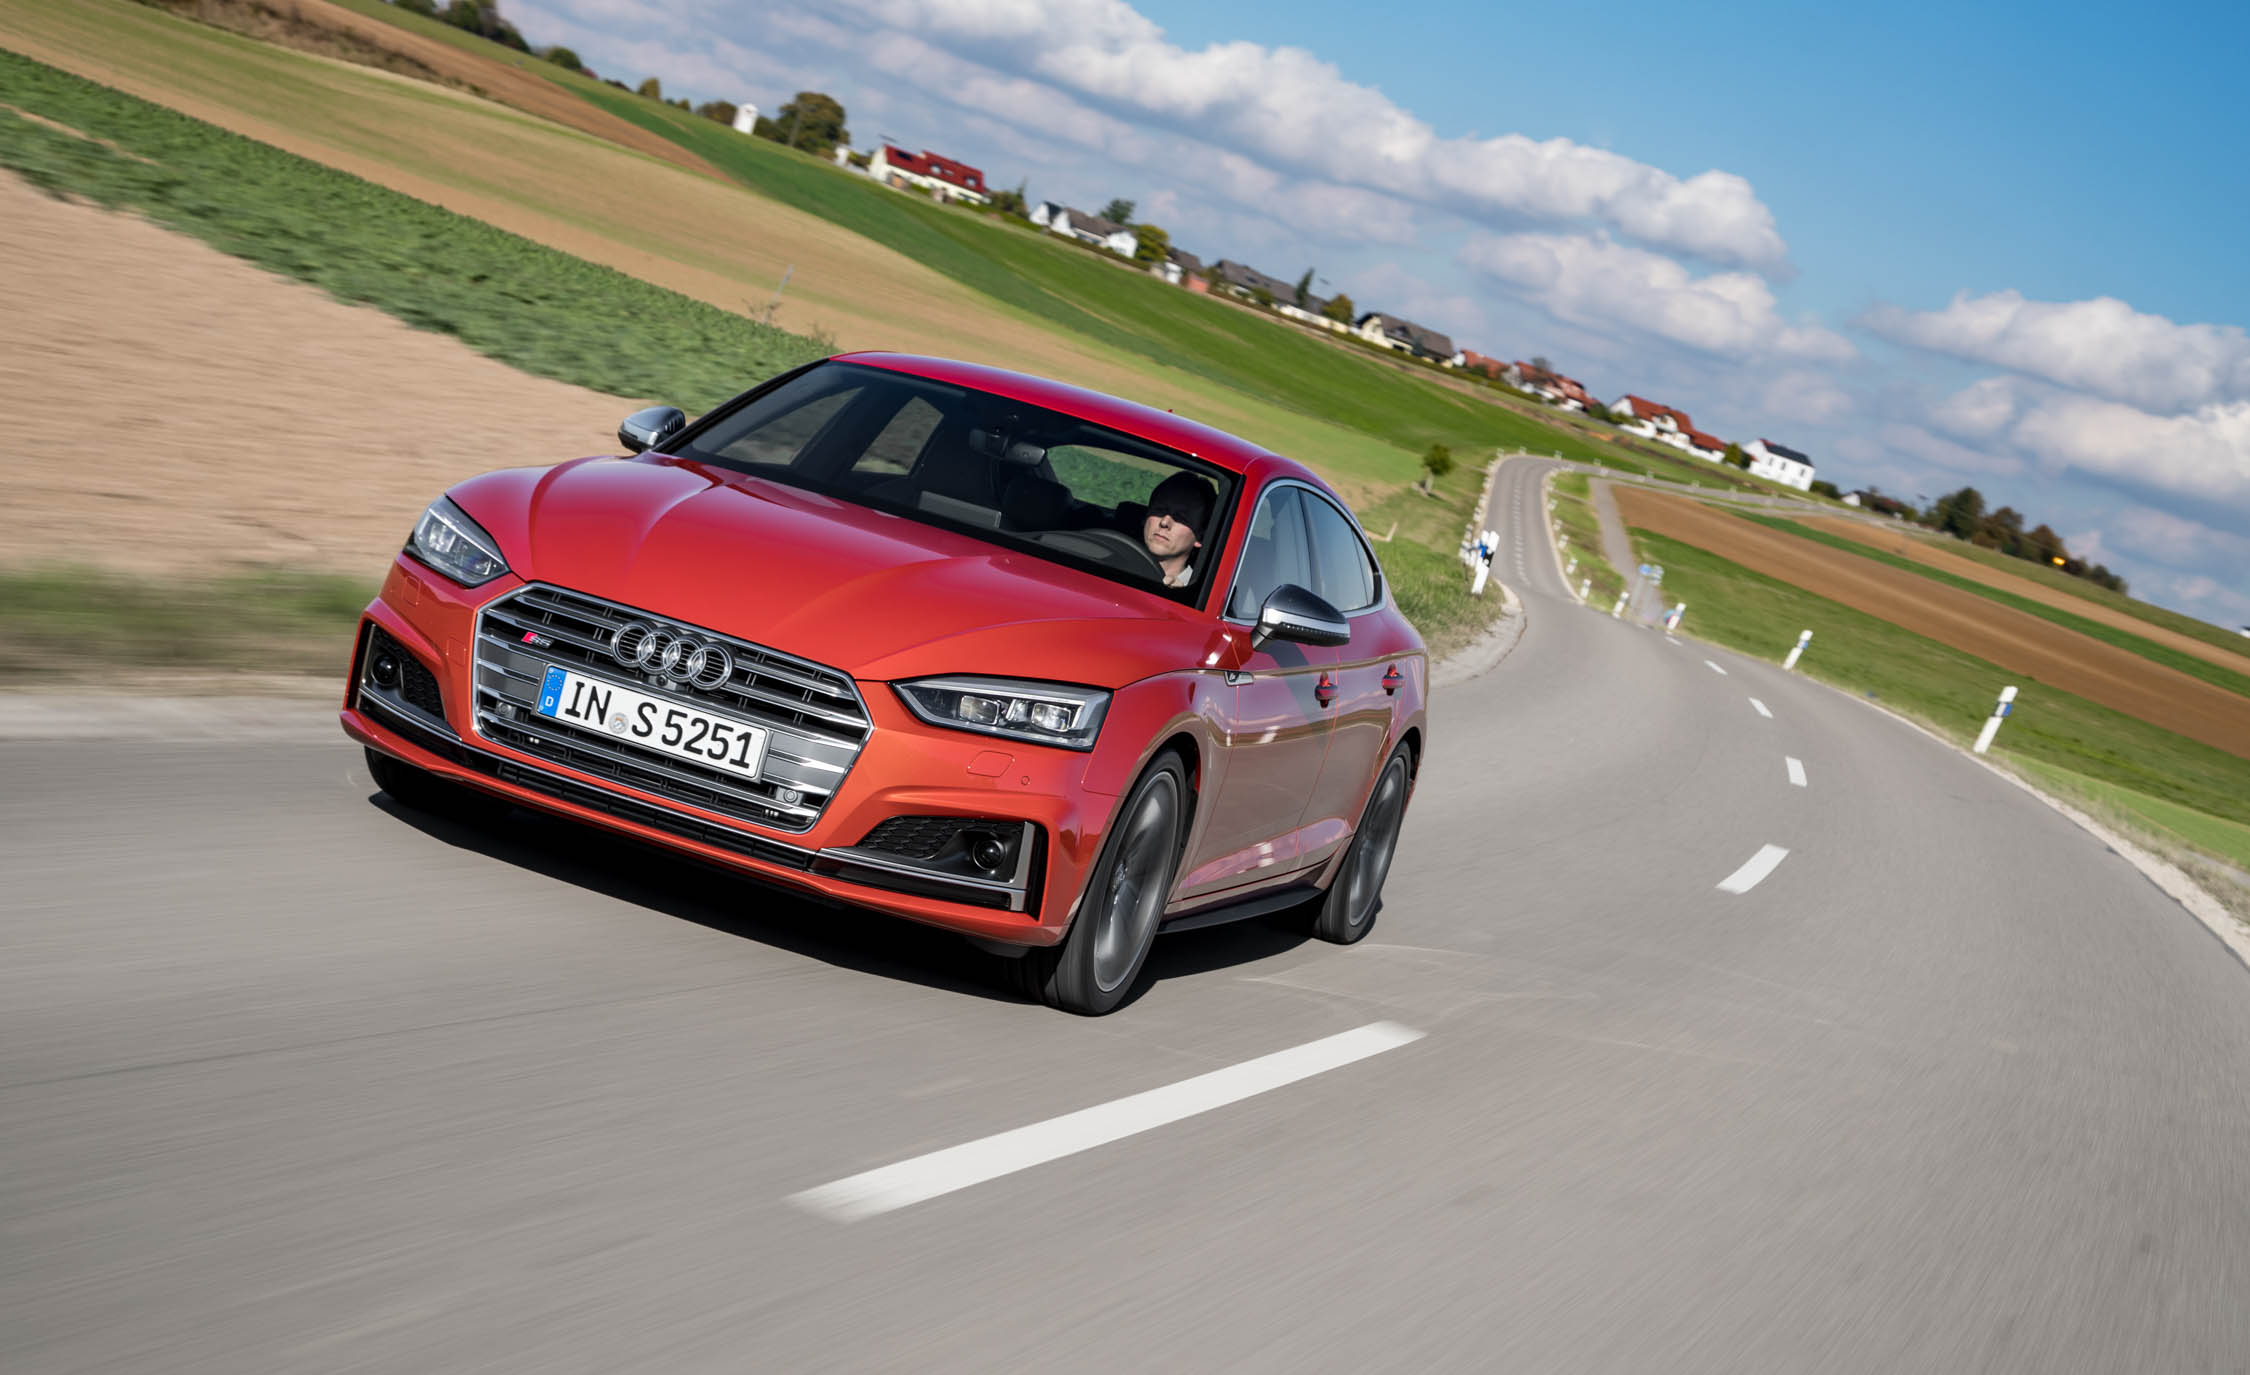 2017 Audi S5 Sportback (View 3 of 10)